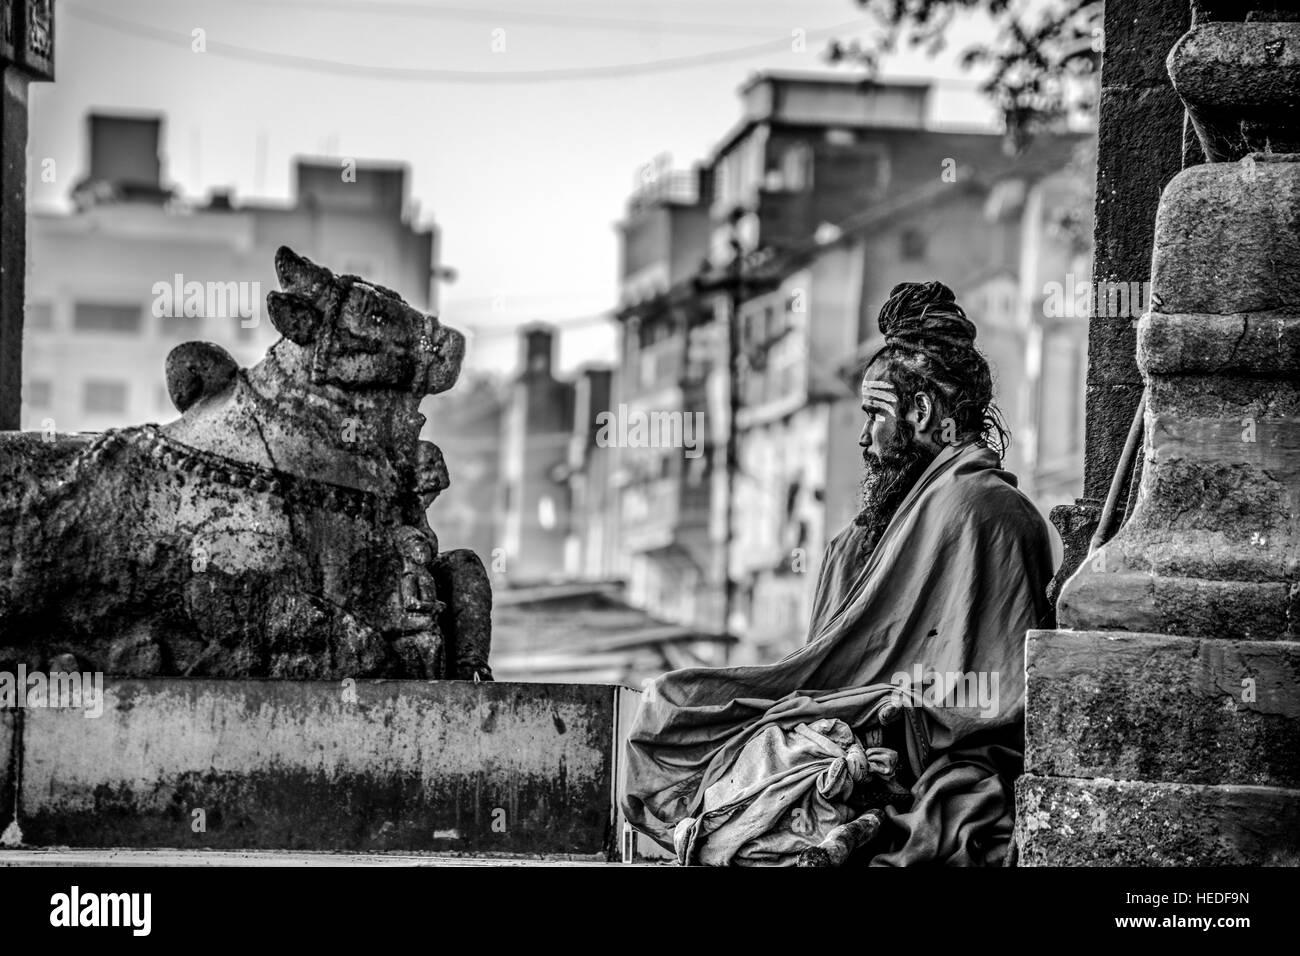 A sadhu peacefully doing his meditation. - Stock Image